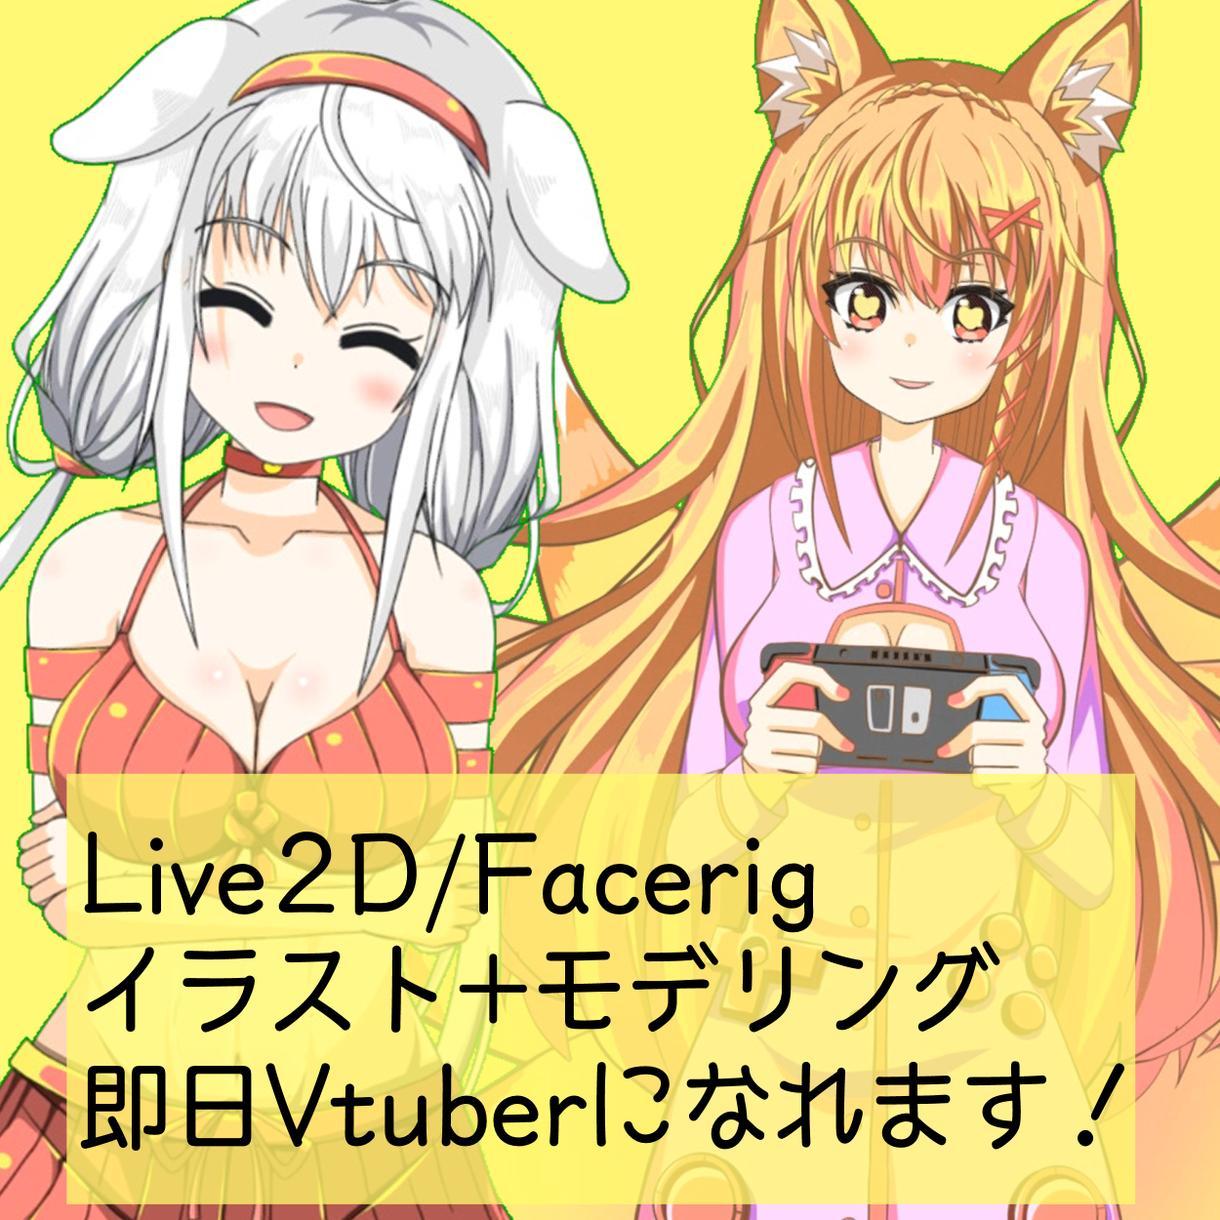 Vtuber(イラスト+Live2D)を作ります 現役VtuberによるVtuberデビューまでのお手伝い! イメージ1